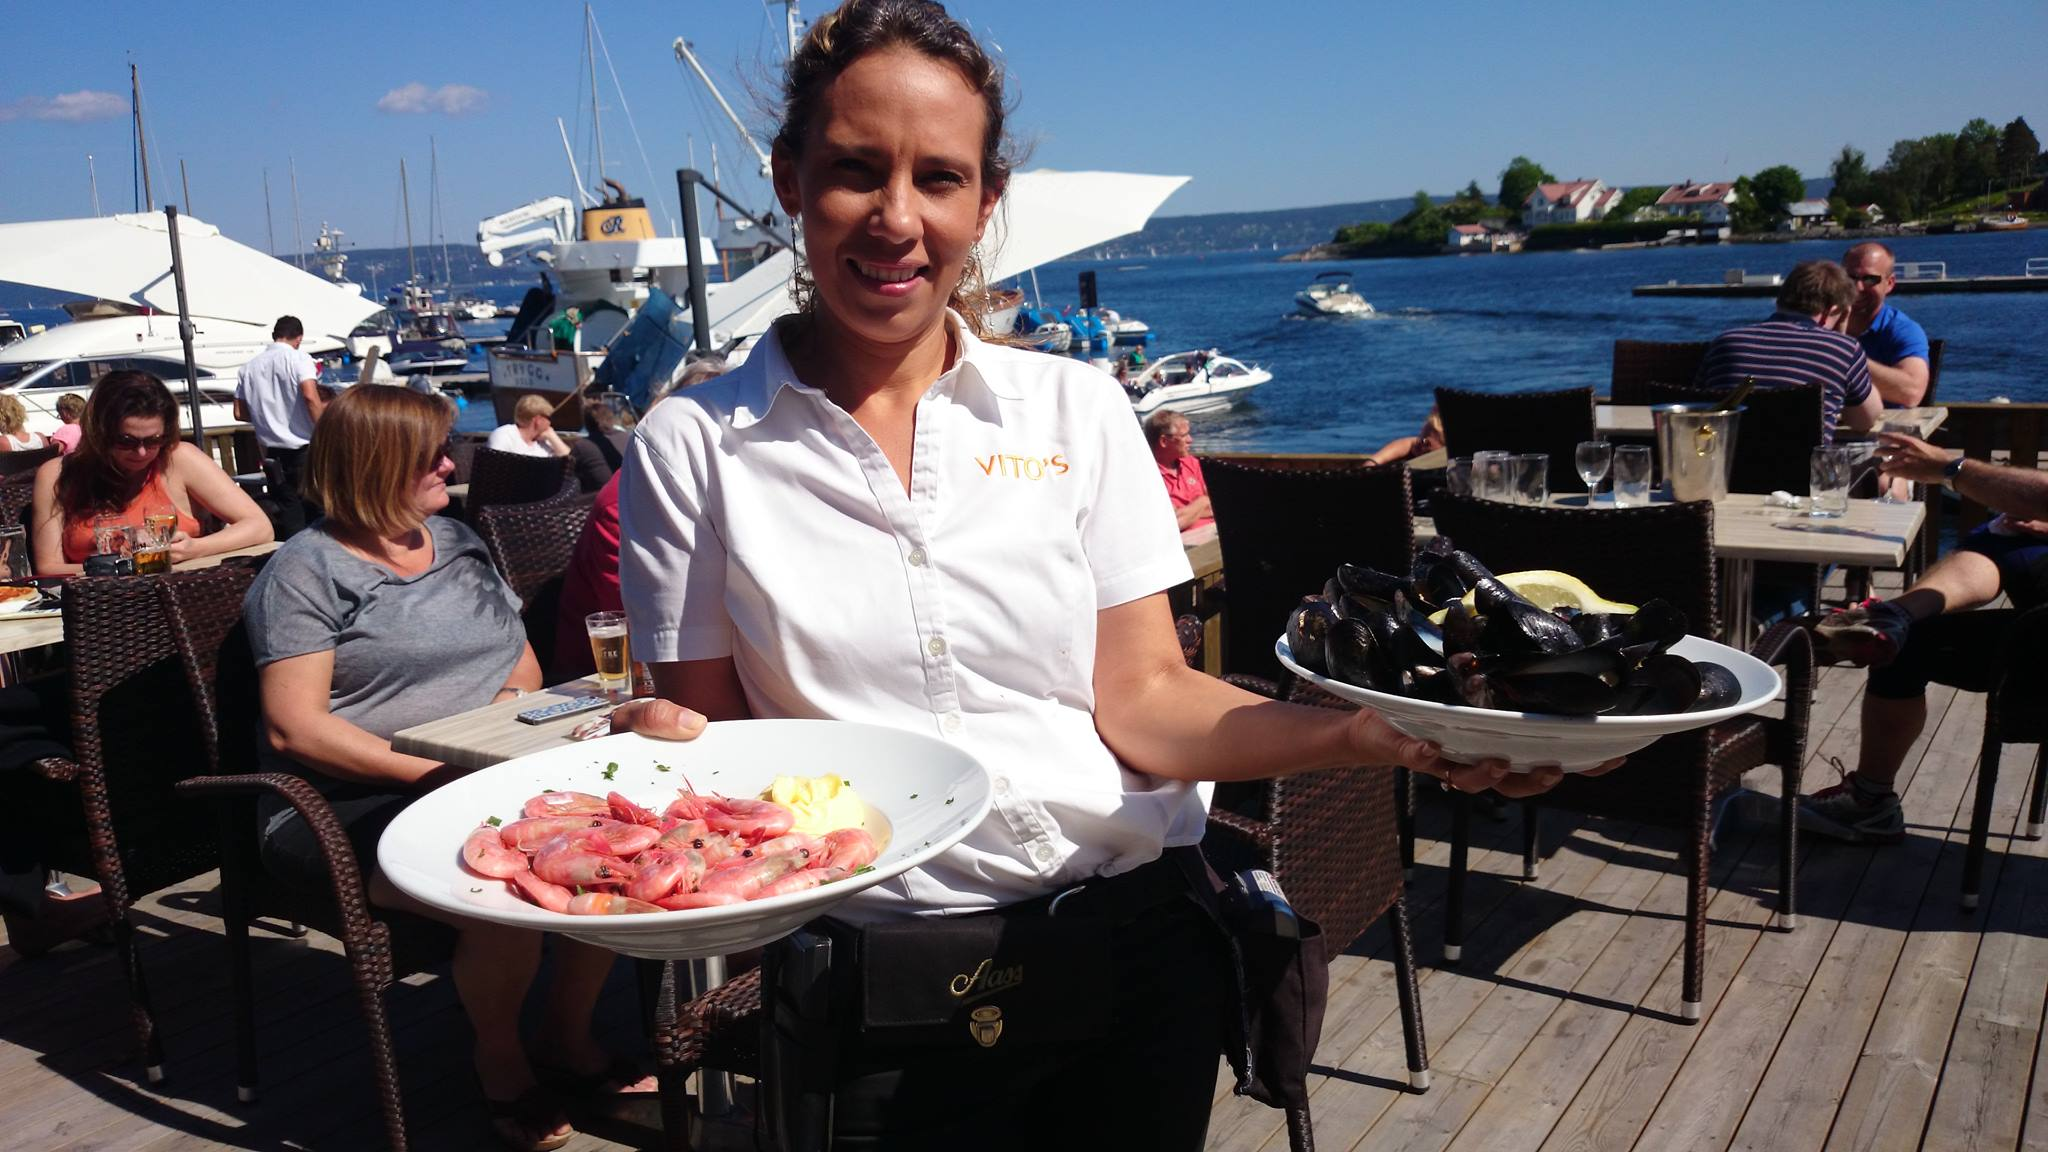 På bryggerestauranten Vitos får du servert super sjømat.